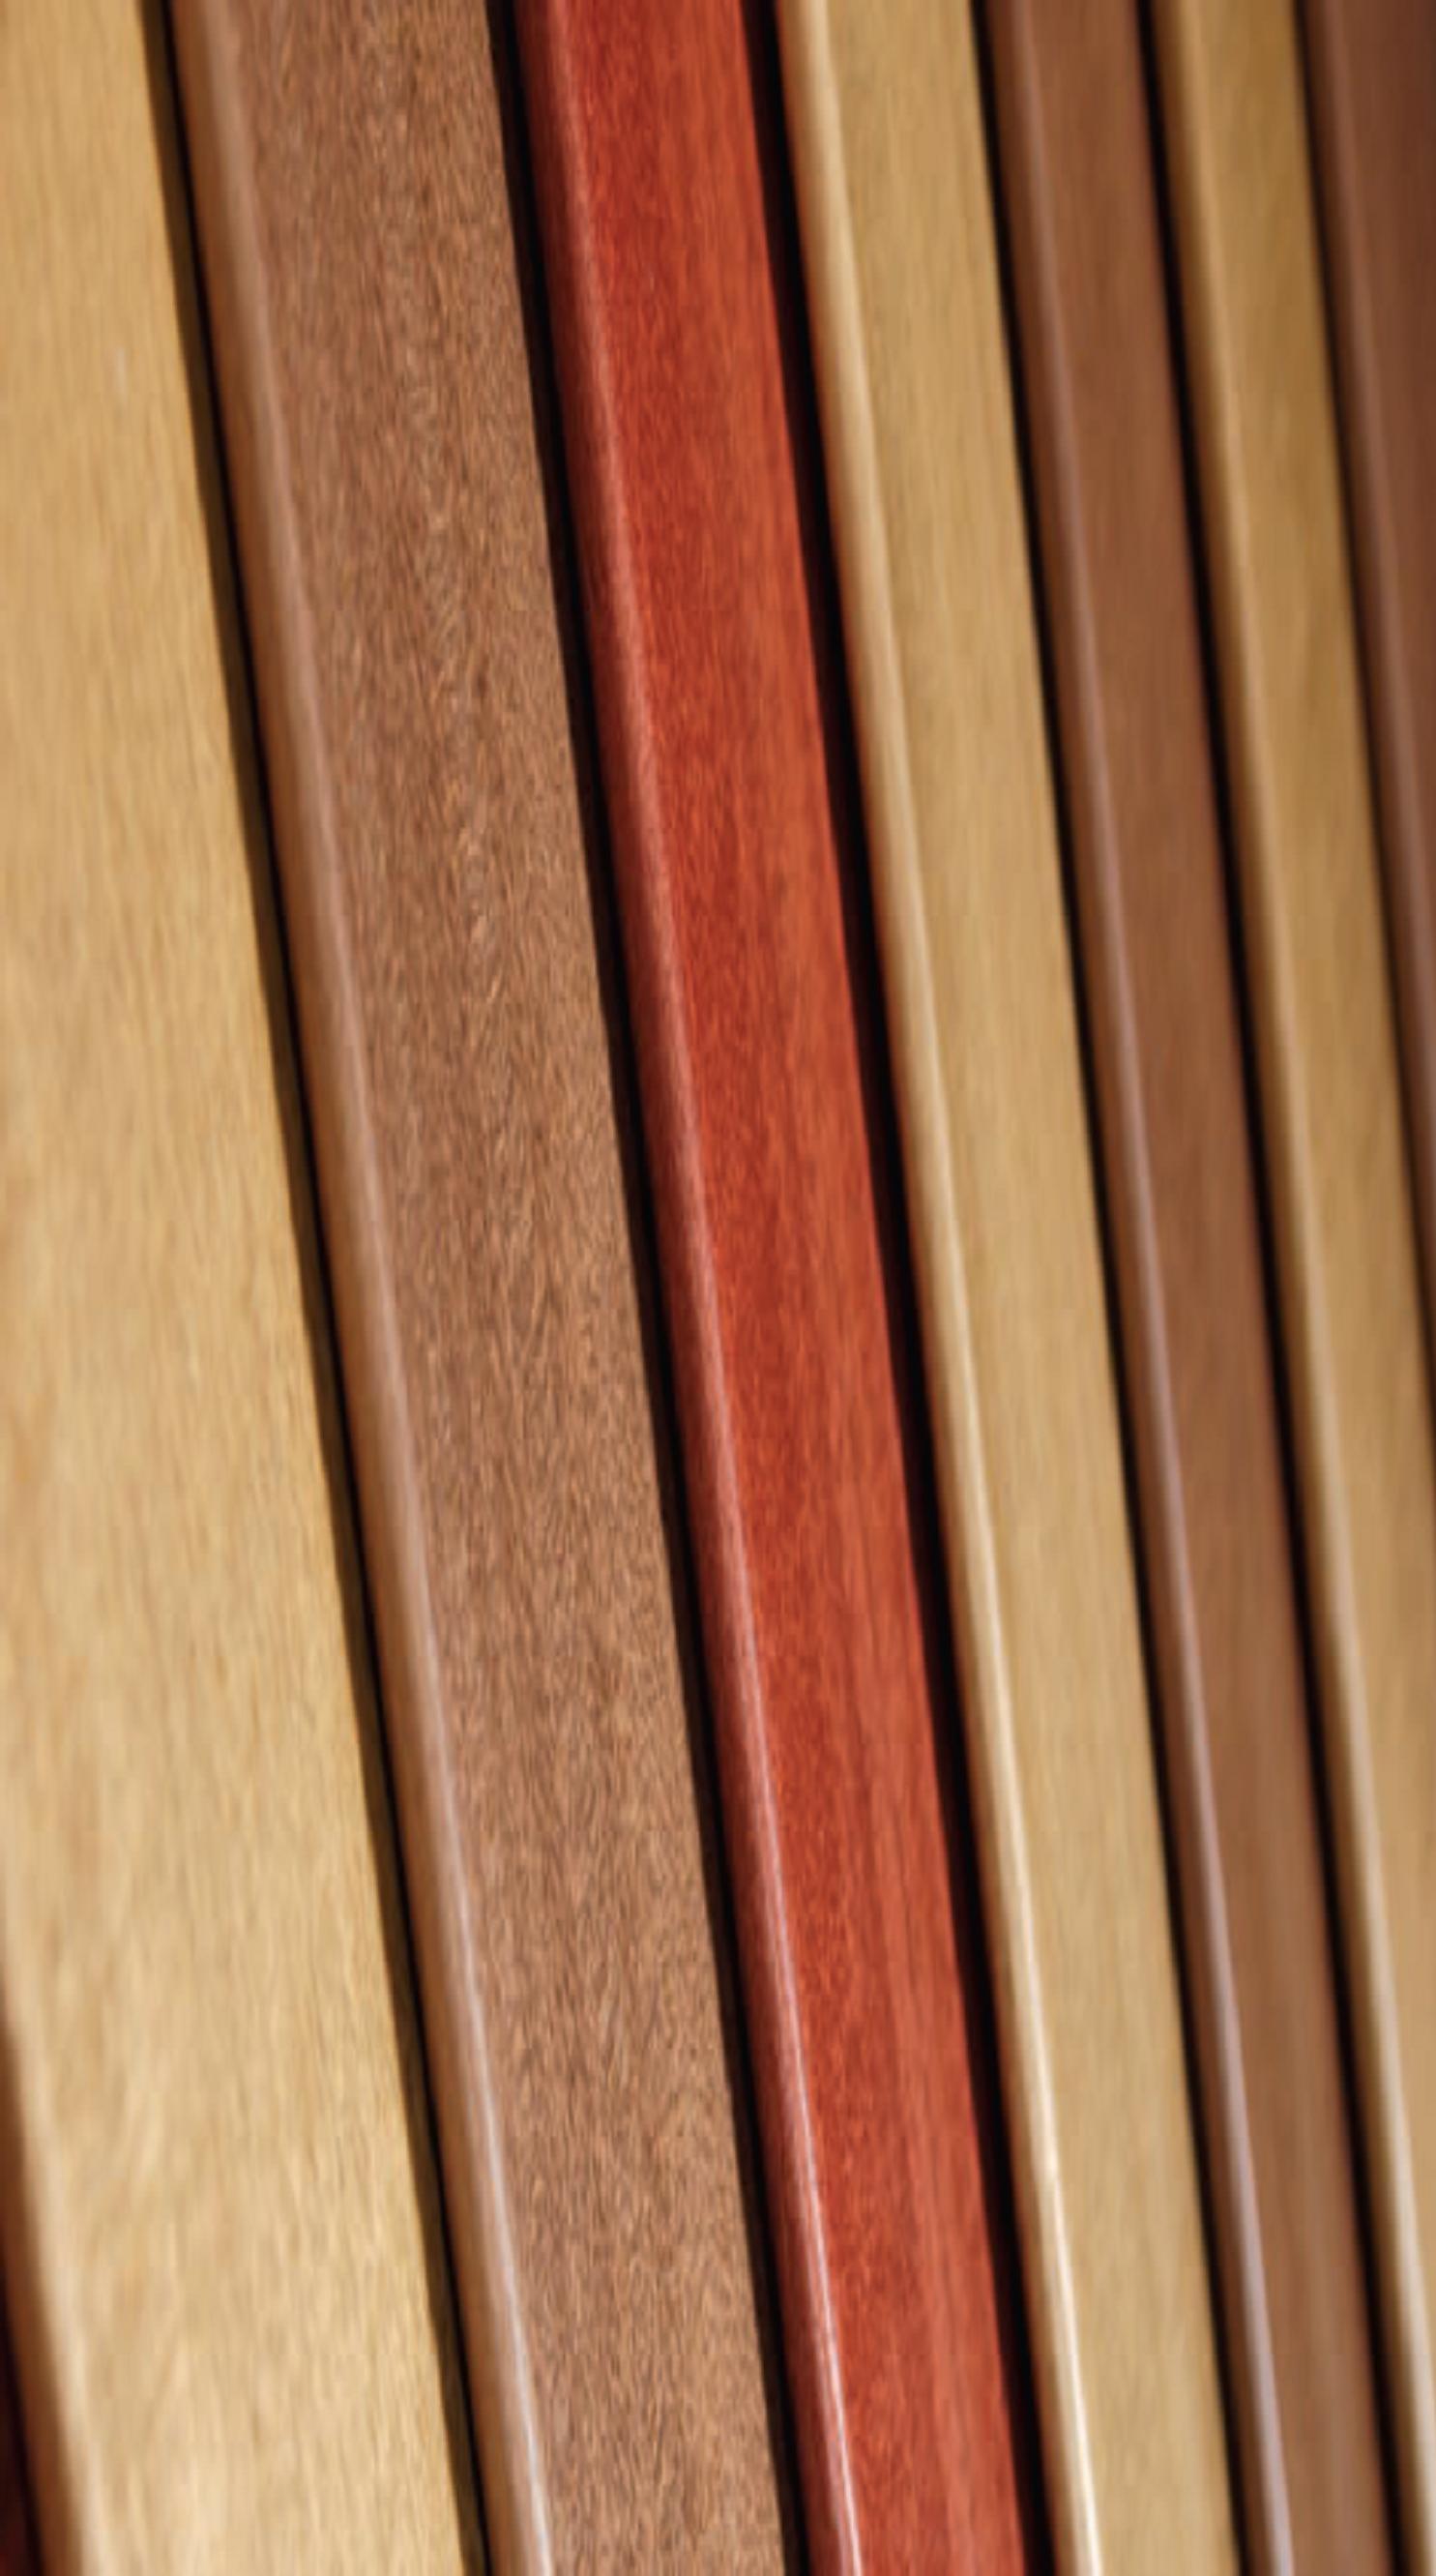 Wonderful Vertical Wooden Blinds Orlando Manufacturer Low Prices Shutters Interior Plantation Wood Custom Faux Vertical Wooden